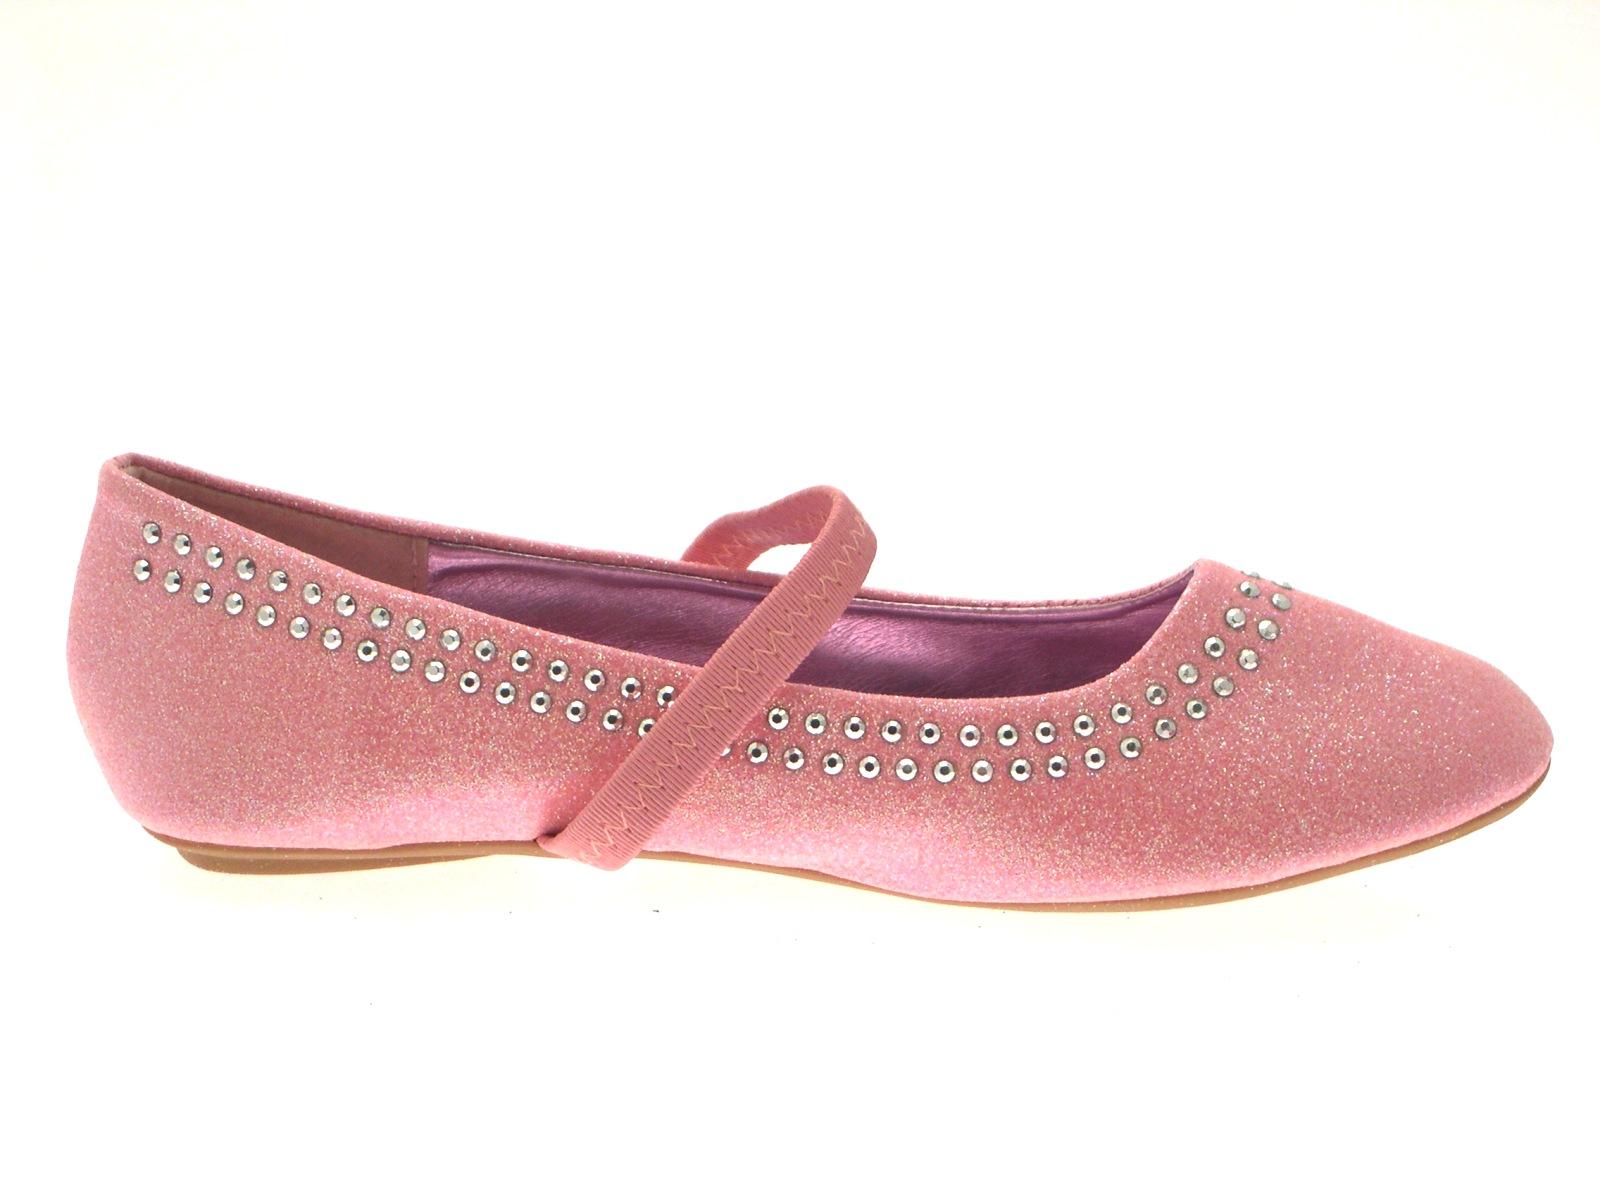 Girls Glitter Studded Party Shoes Mary Janes Flat Ballet Pumps Kids Size UK 9-2 | EBay